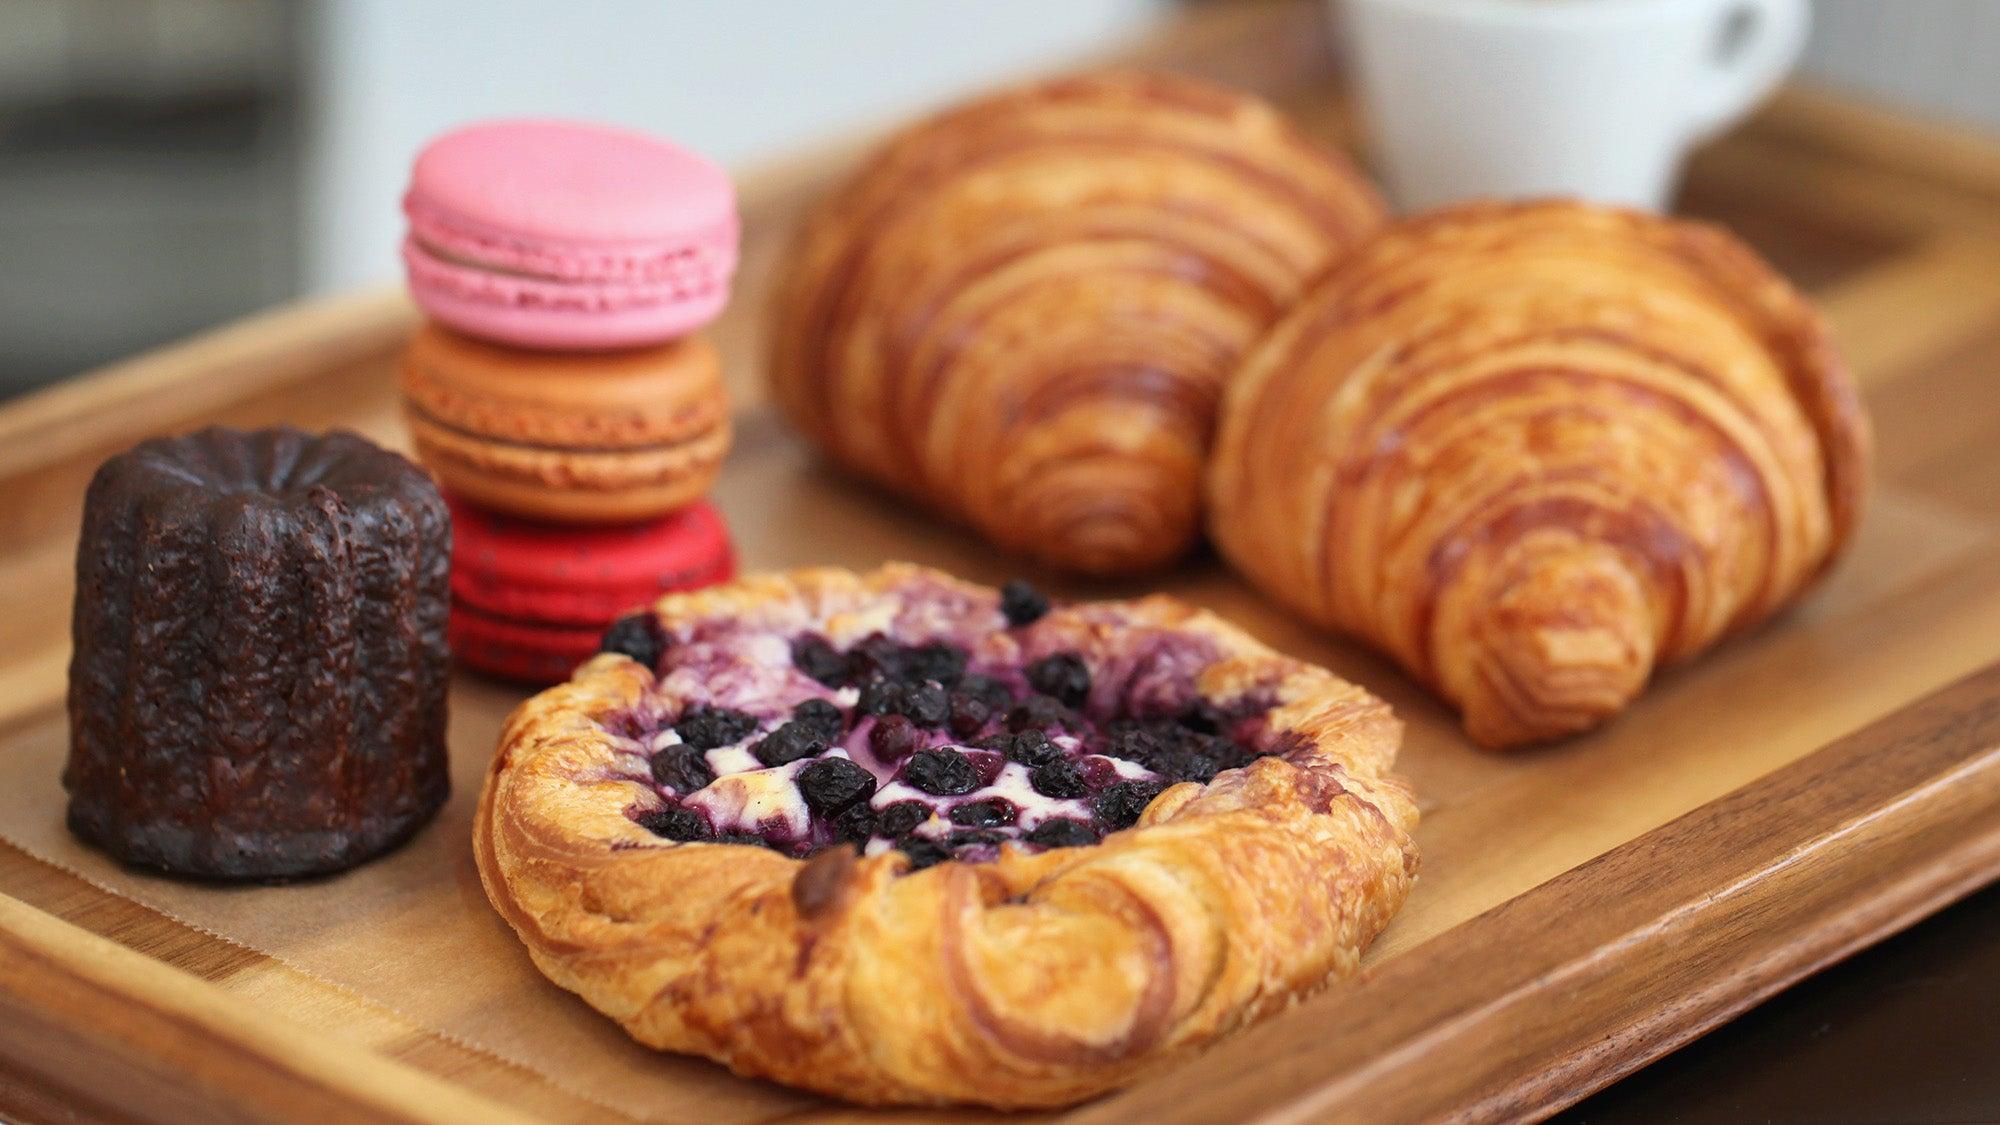 Pastries at Café Madeleine